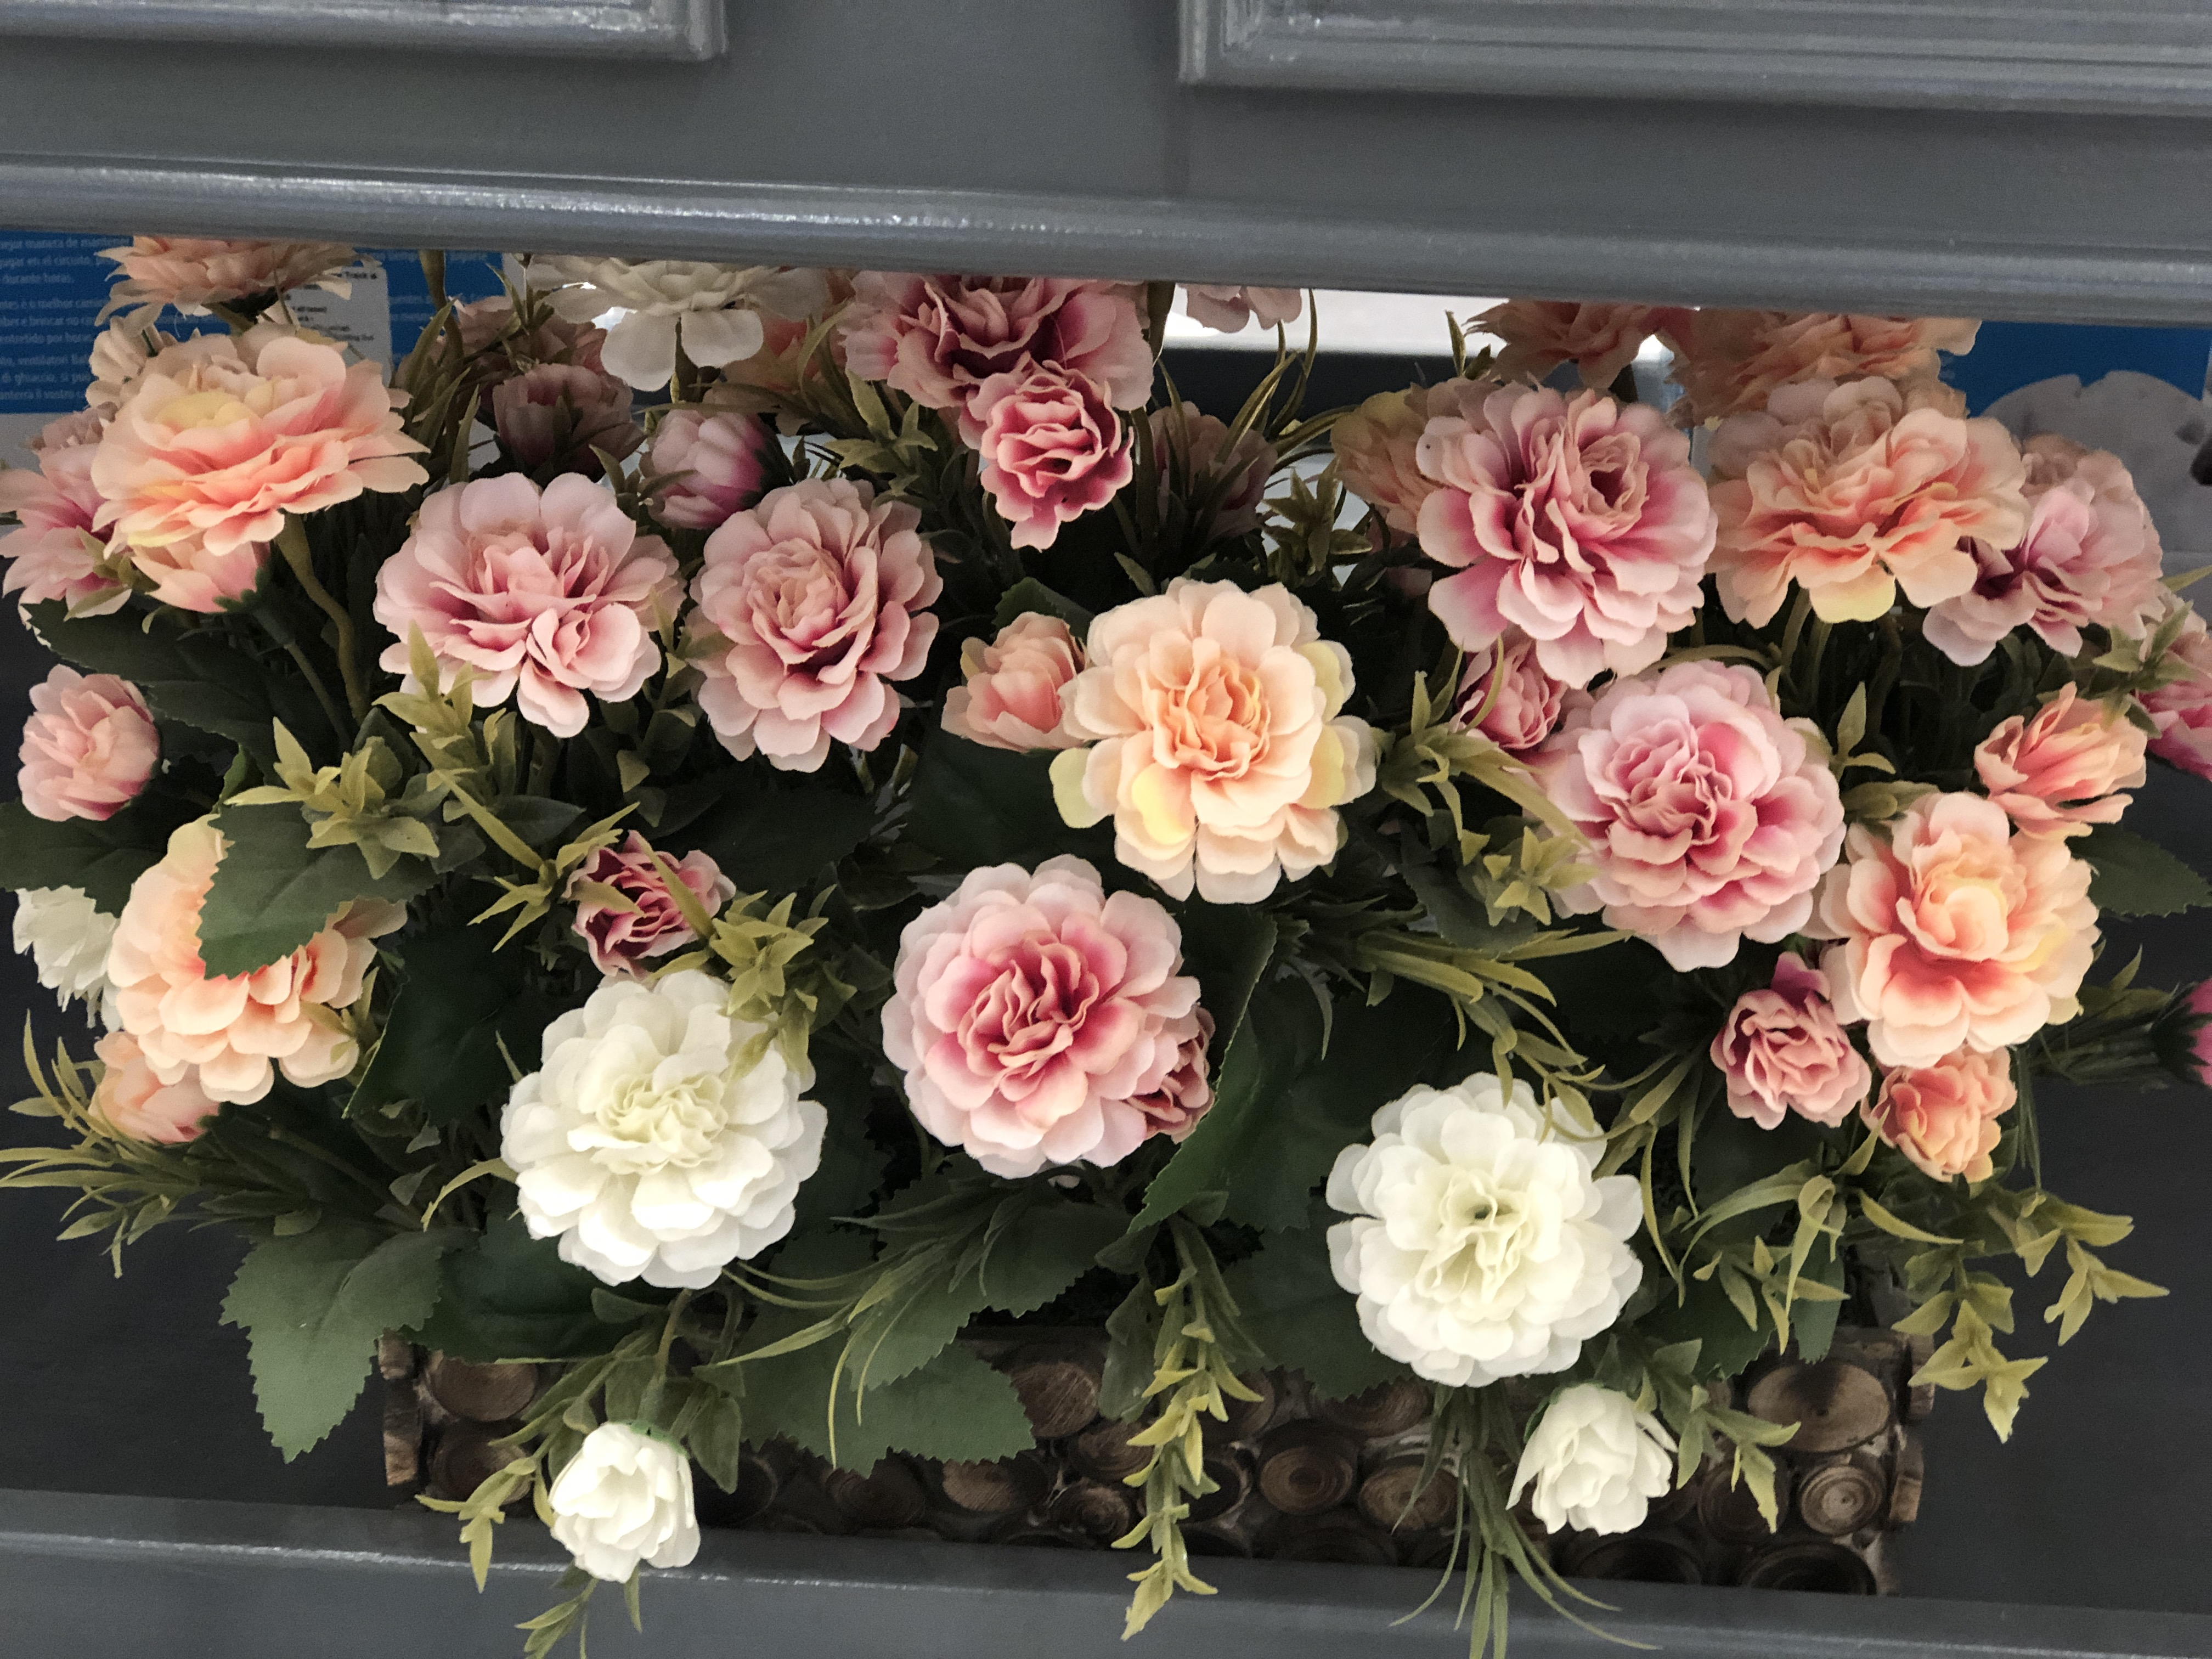 wordless-wednesday-natasha-musing-weekend-vibes-flowers